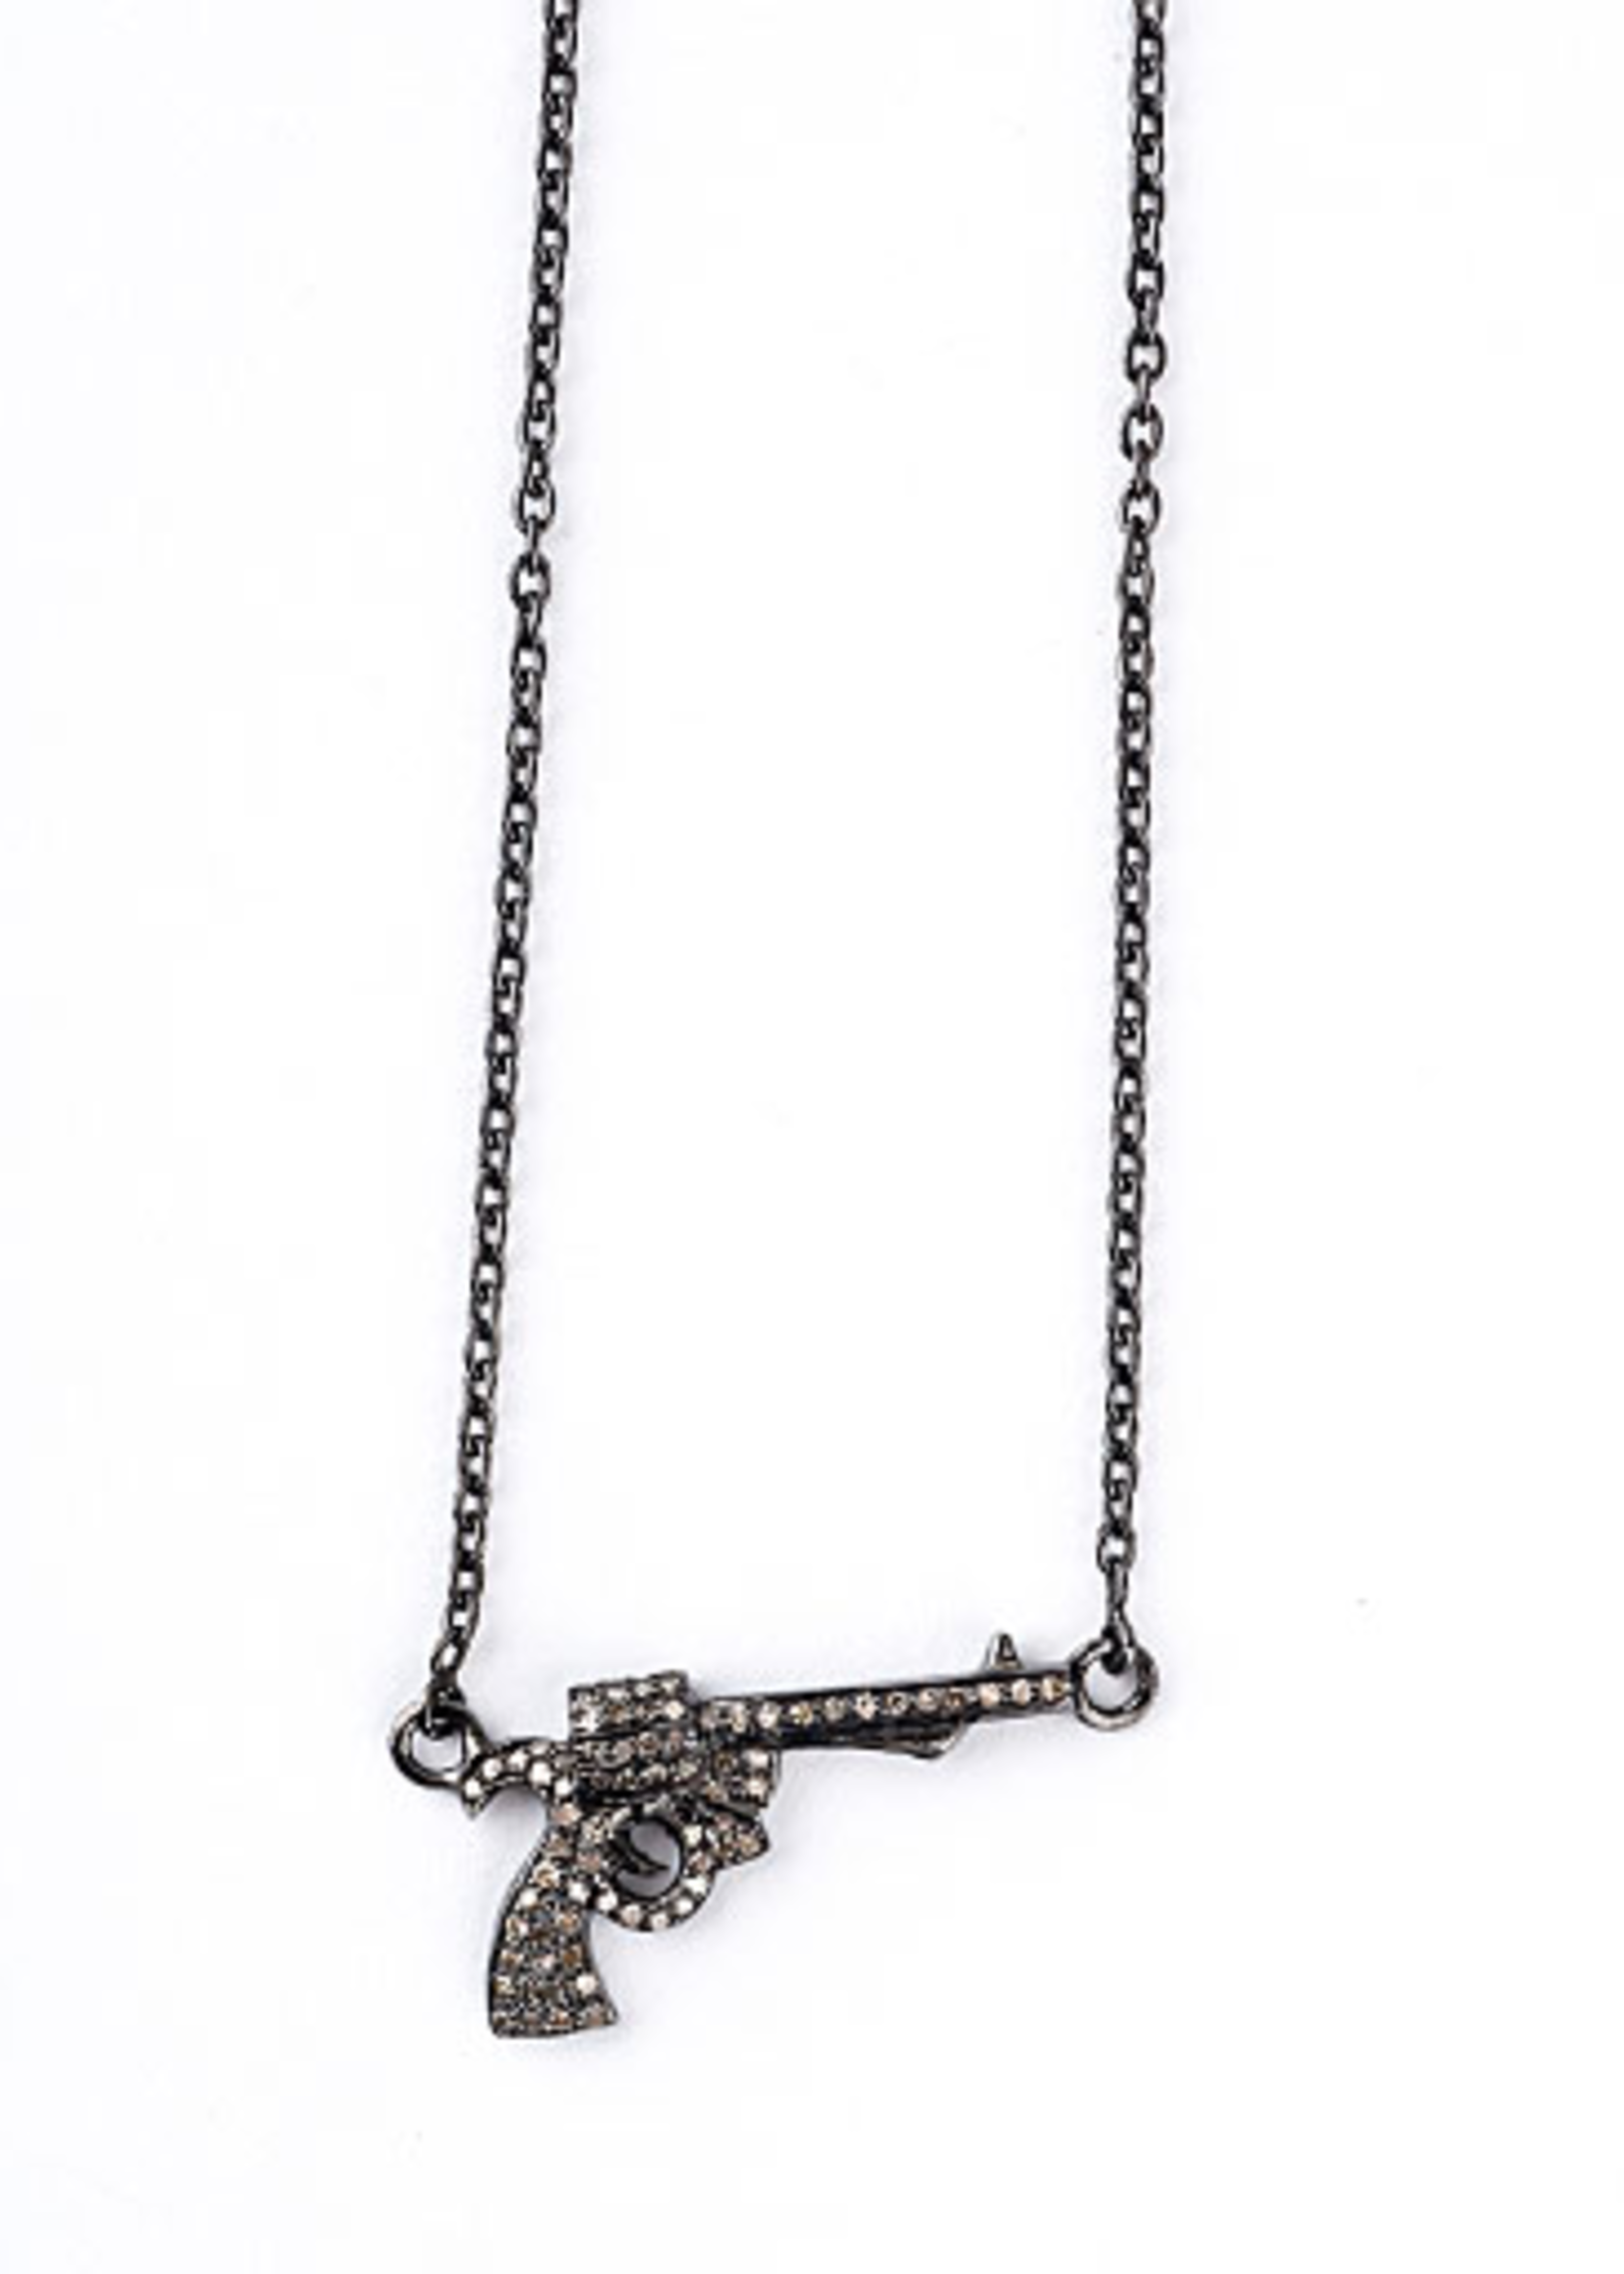 Mina Danielle Diamond Gun on Oxidized Chain